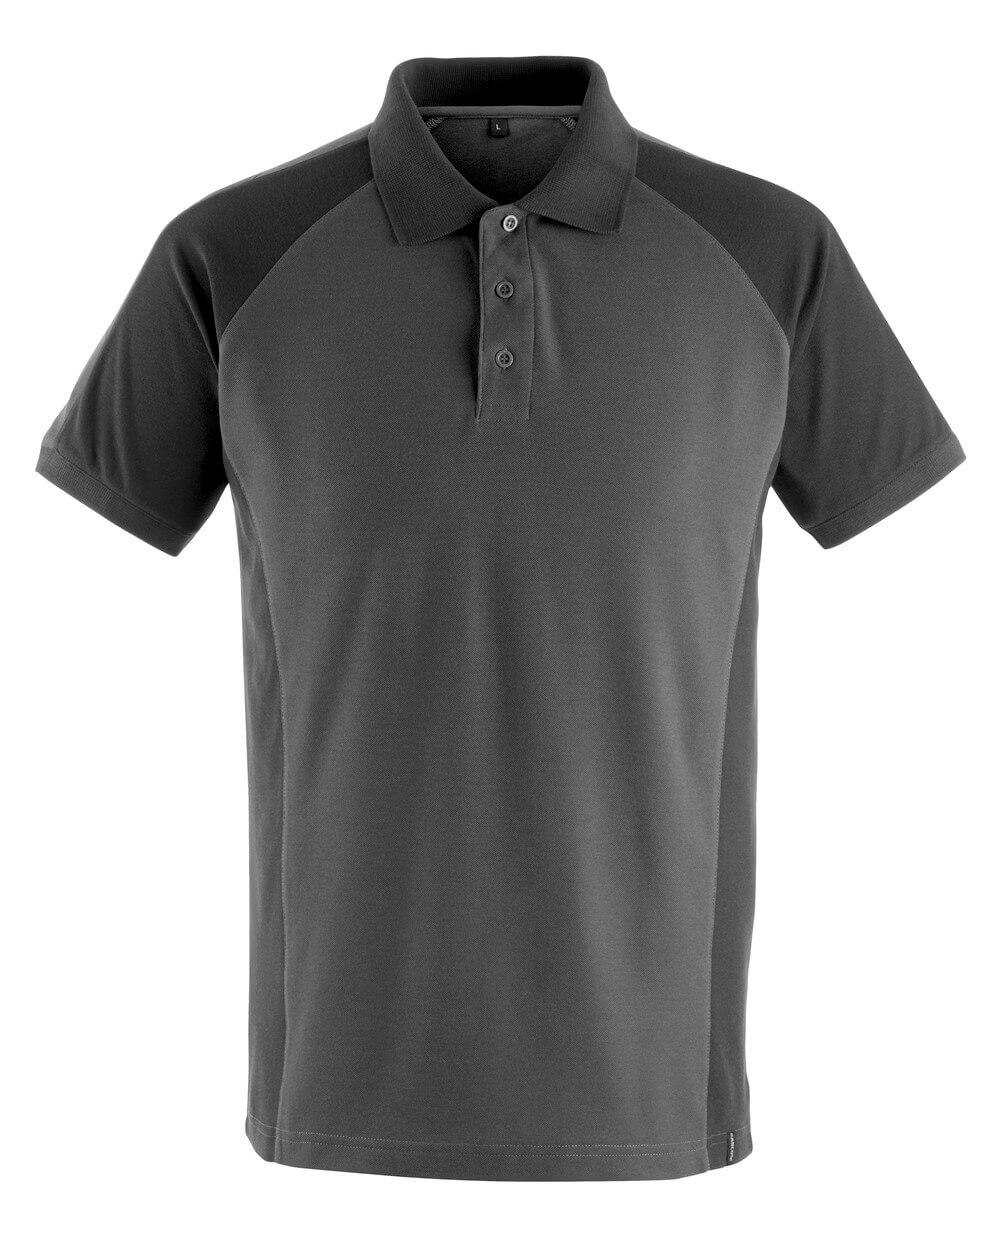 50569-961-1809 Poloshirt - donkerantraciet/zwart